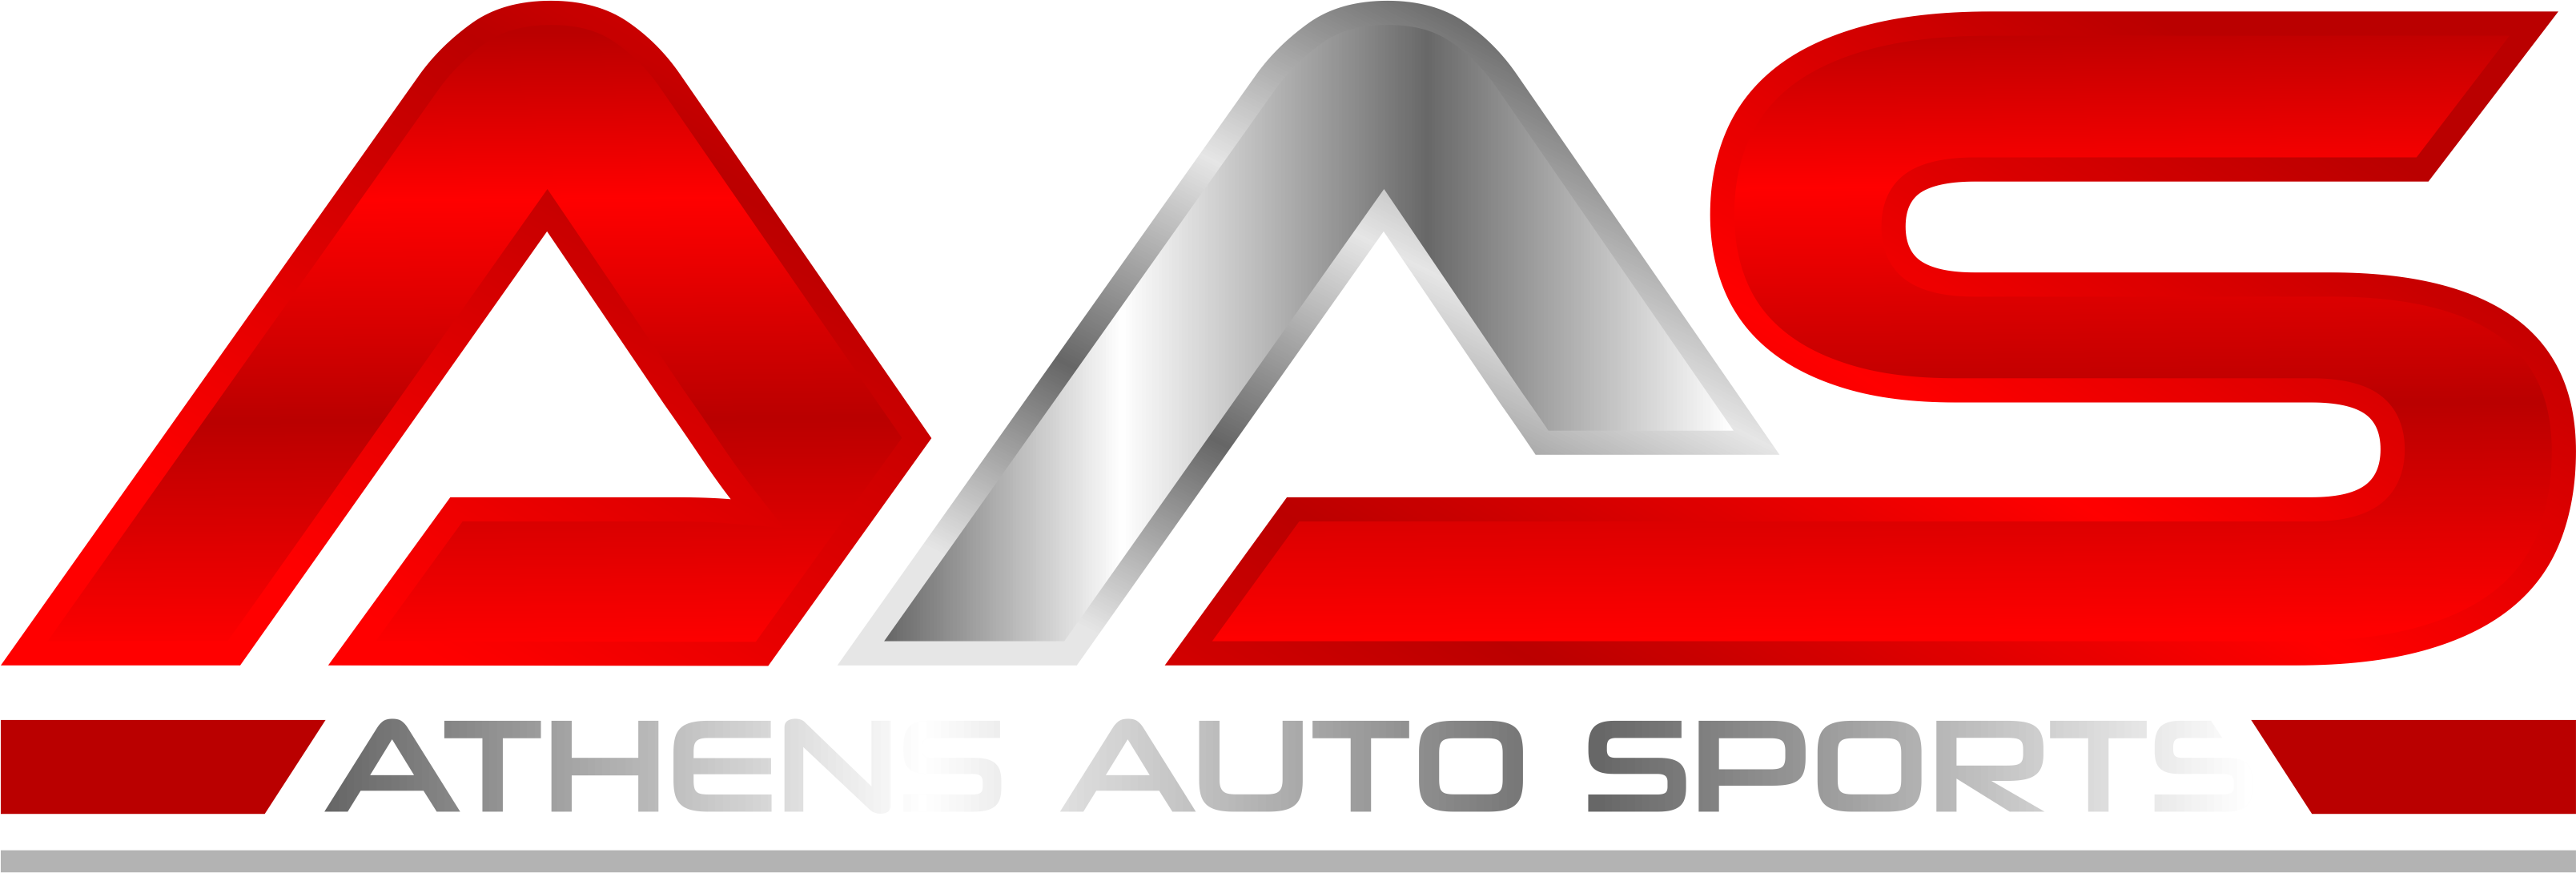 Create a sleek logo for a luxury custom auto shop- think East Coast Pimp My Ride